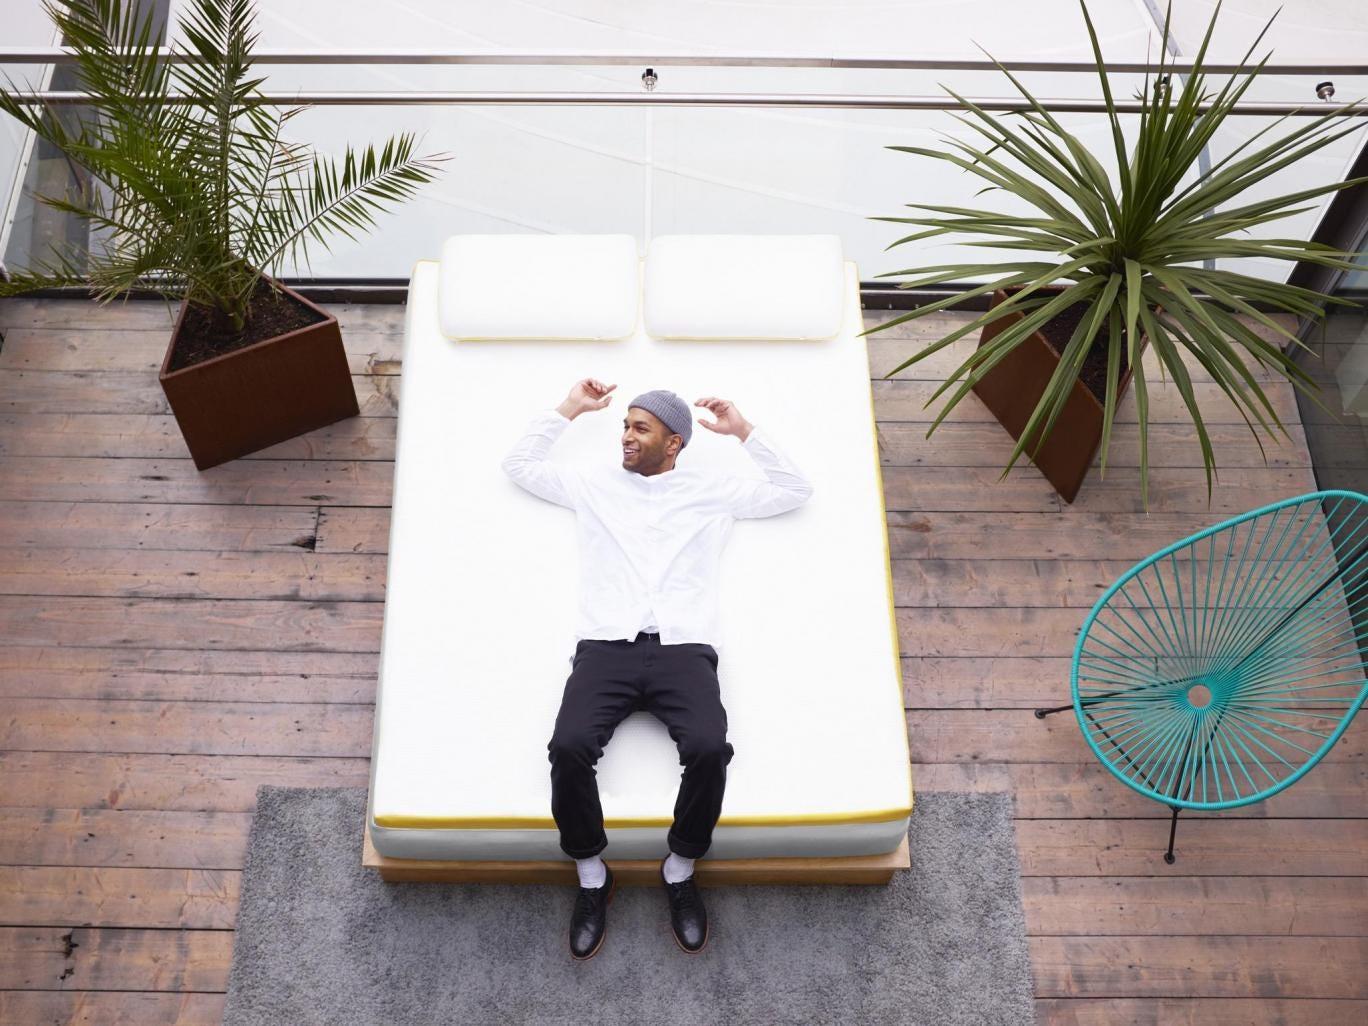 11 Best Beds The Independent Sleep Center Comforta Perfect F 90x200 Matras 9 Mattress Toppers